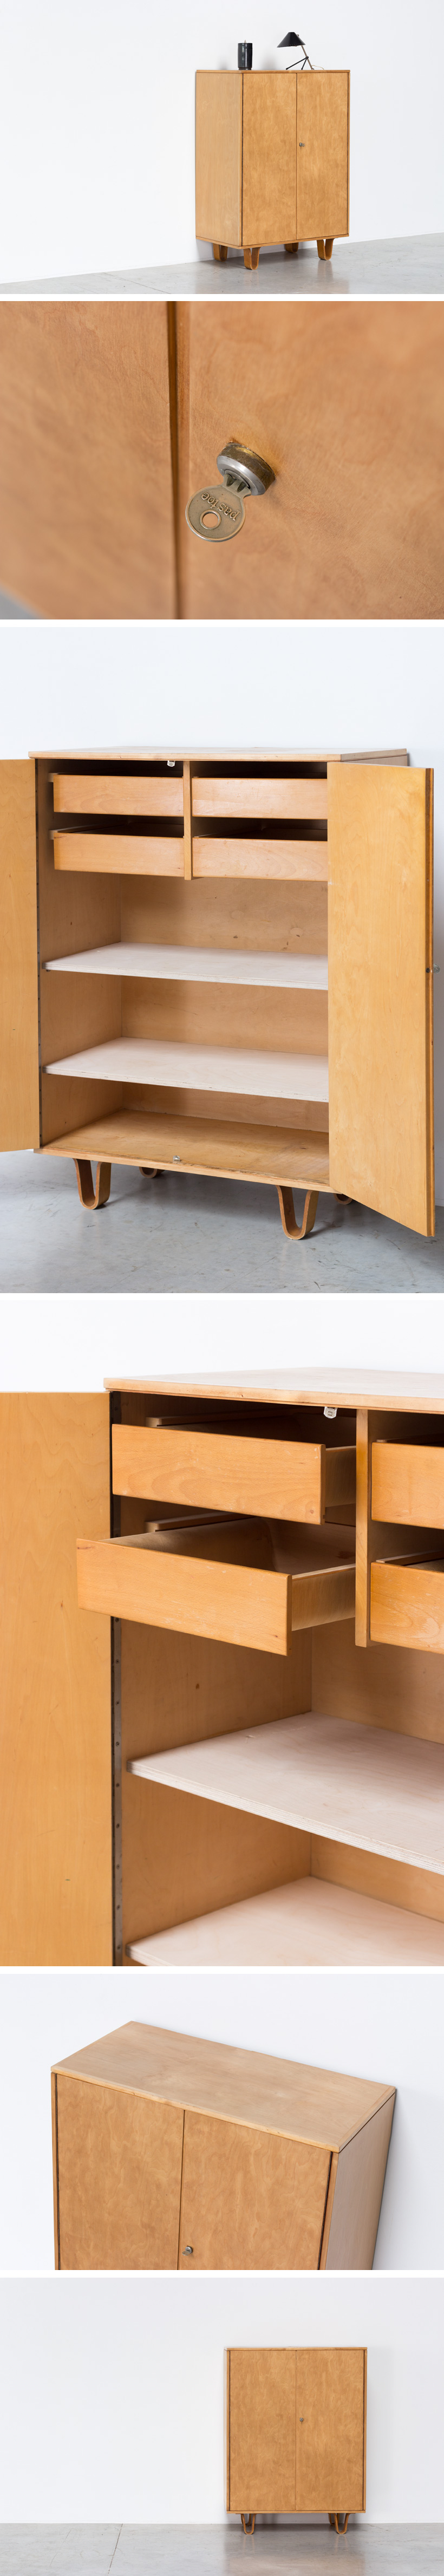 Cees Braakman cabinet cupboard Combex series Large